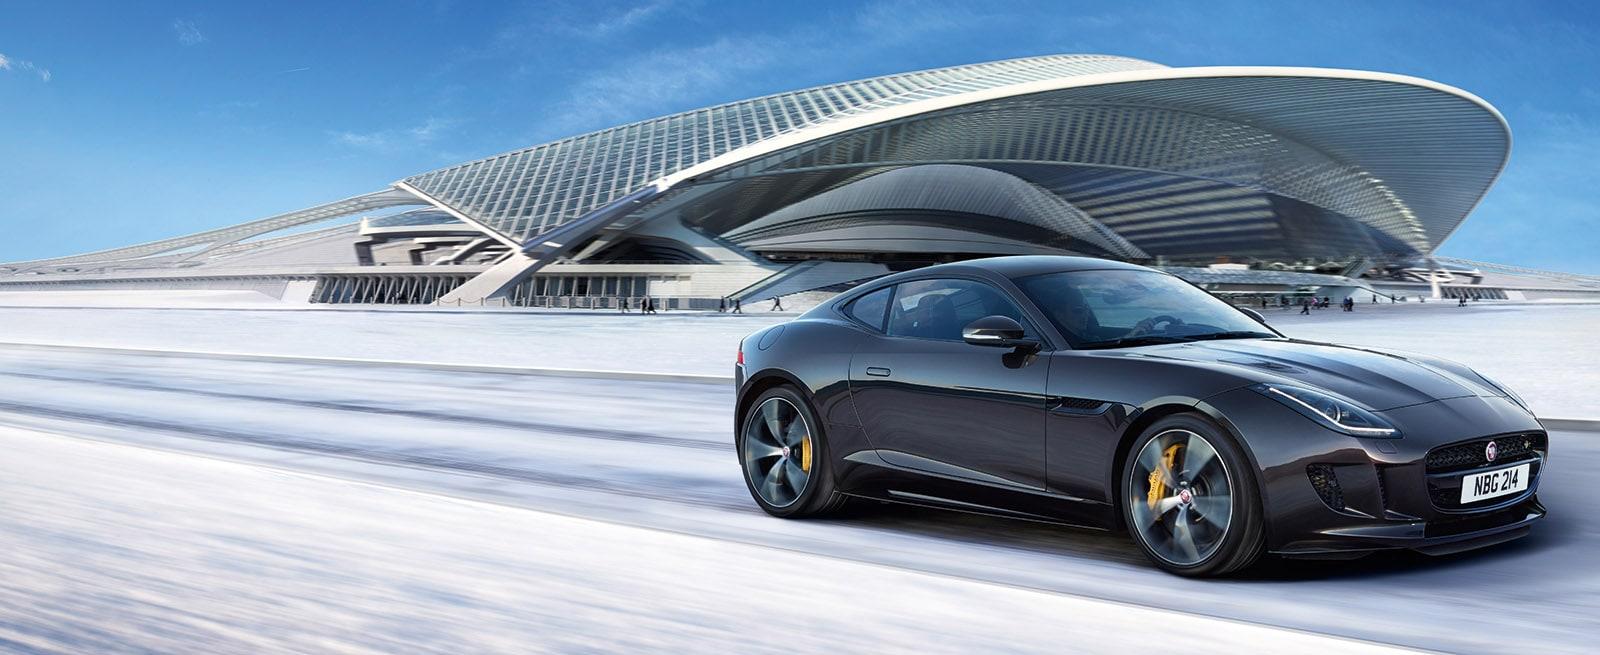 A Grey Jaguar F-Type Racing Down a Snowy Track